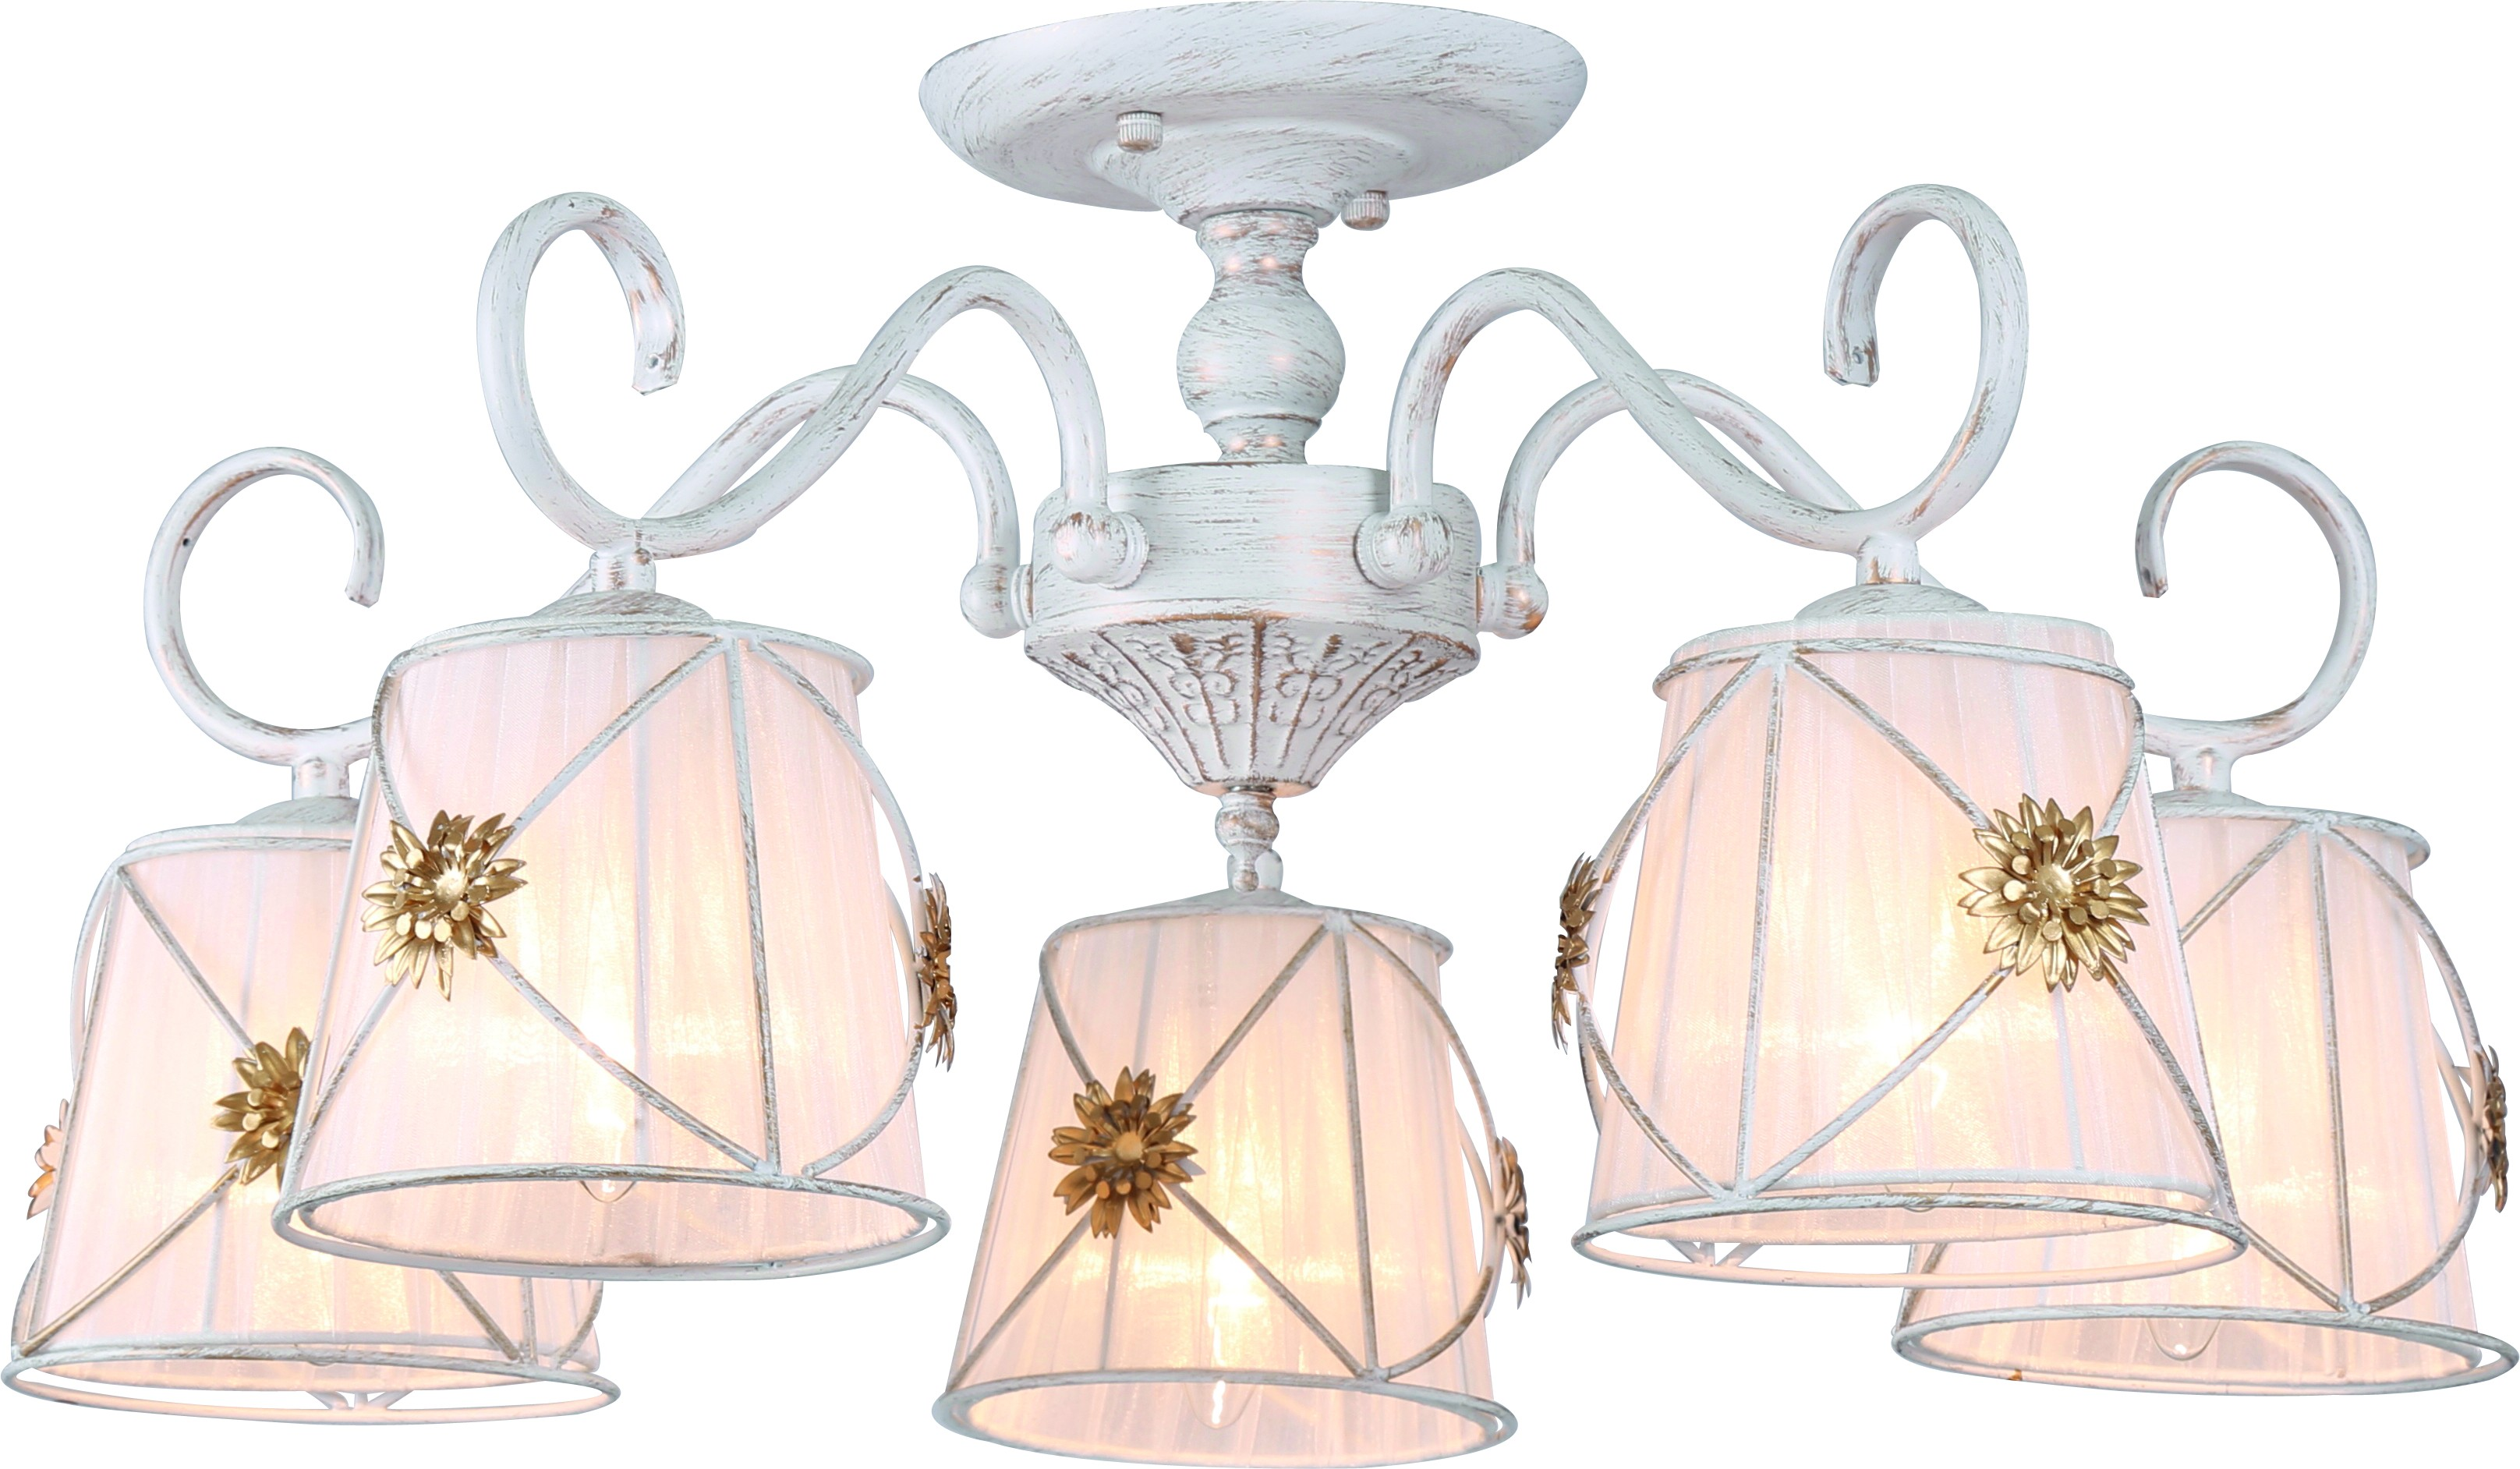 Люстра Arte lamp A5495pl-5wg люстра на штанге arte lamp fortuna a5495pl 5br